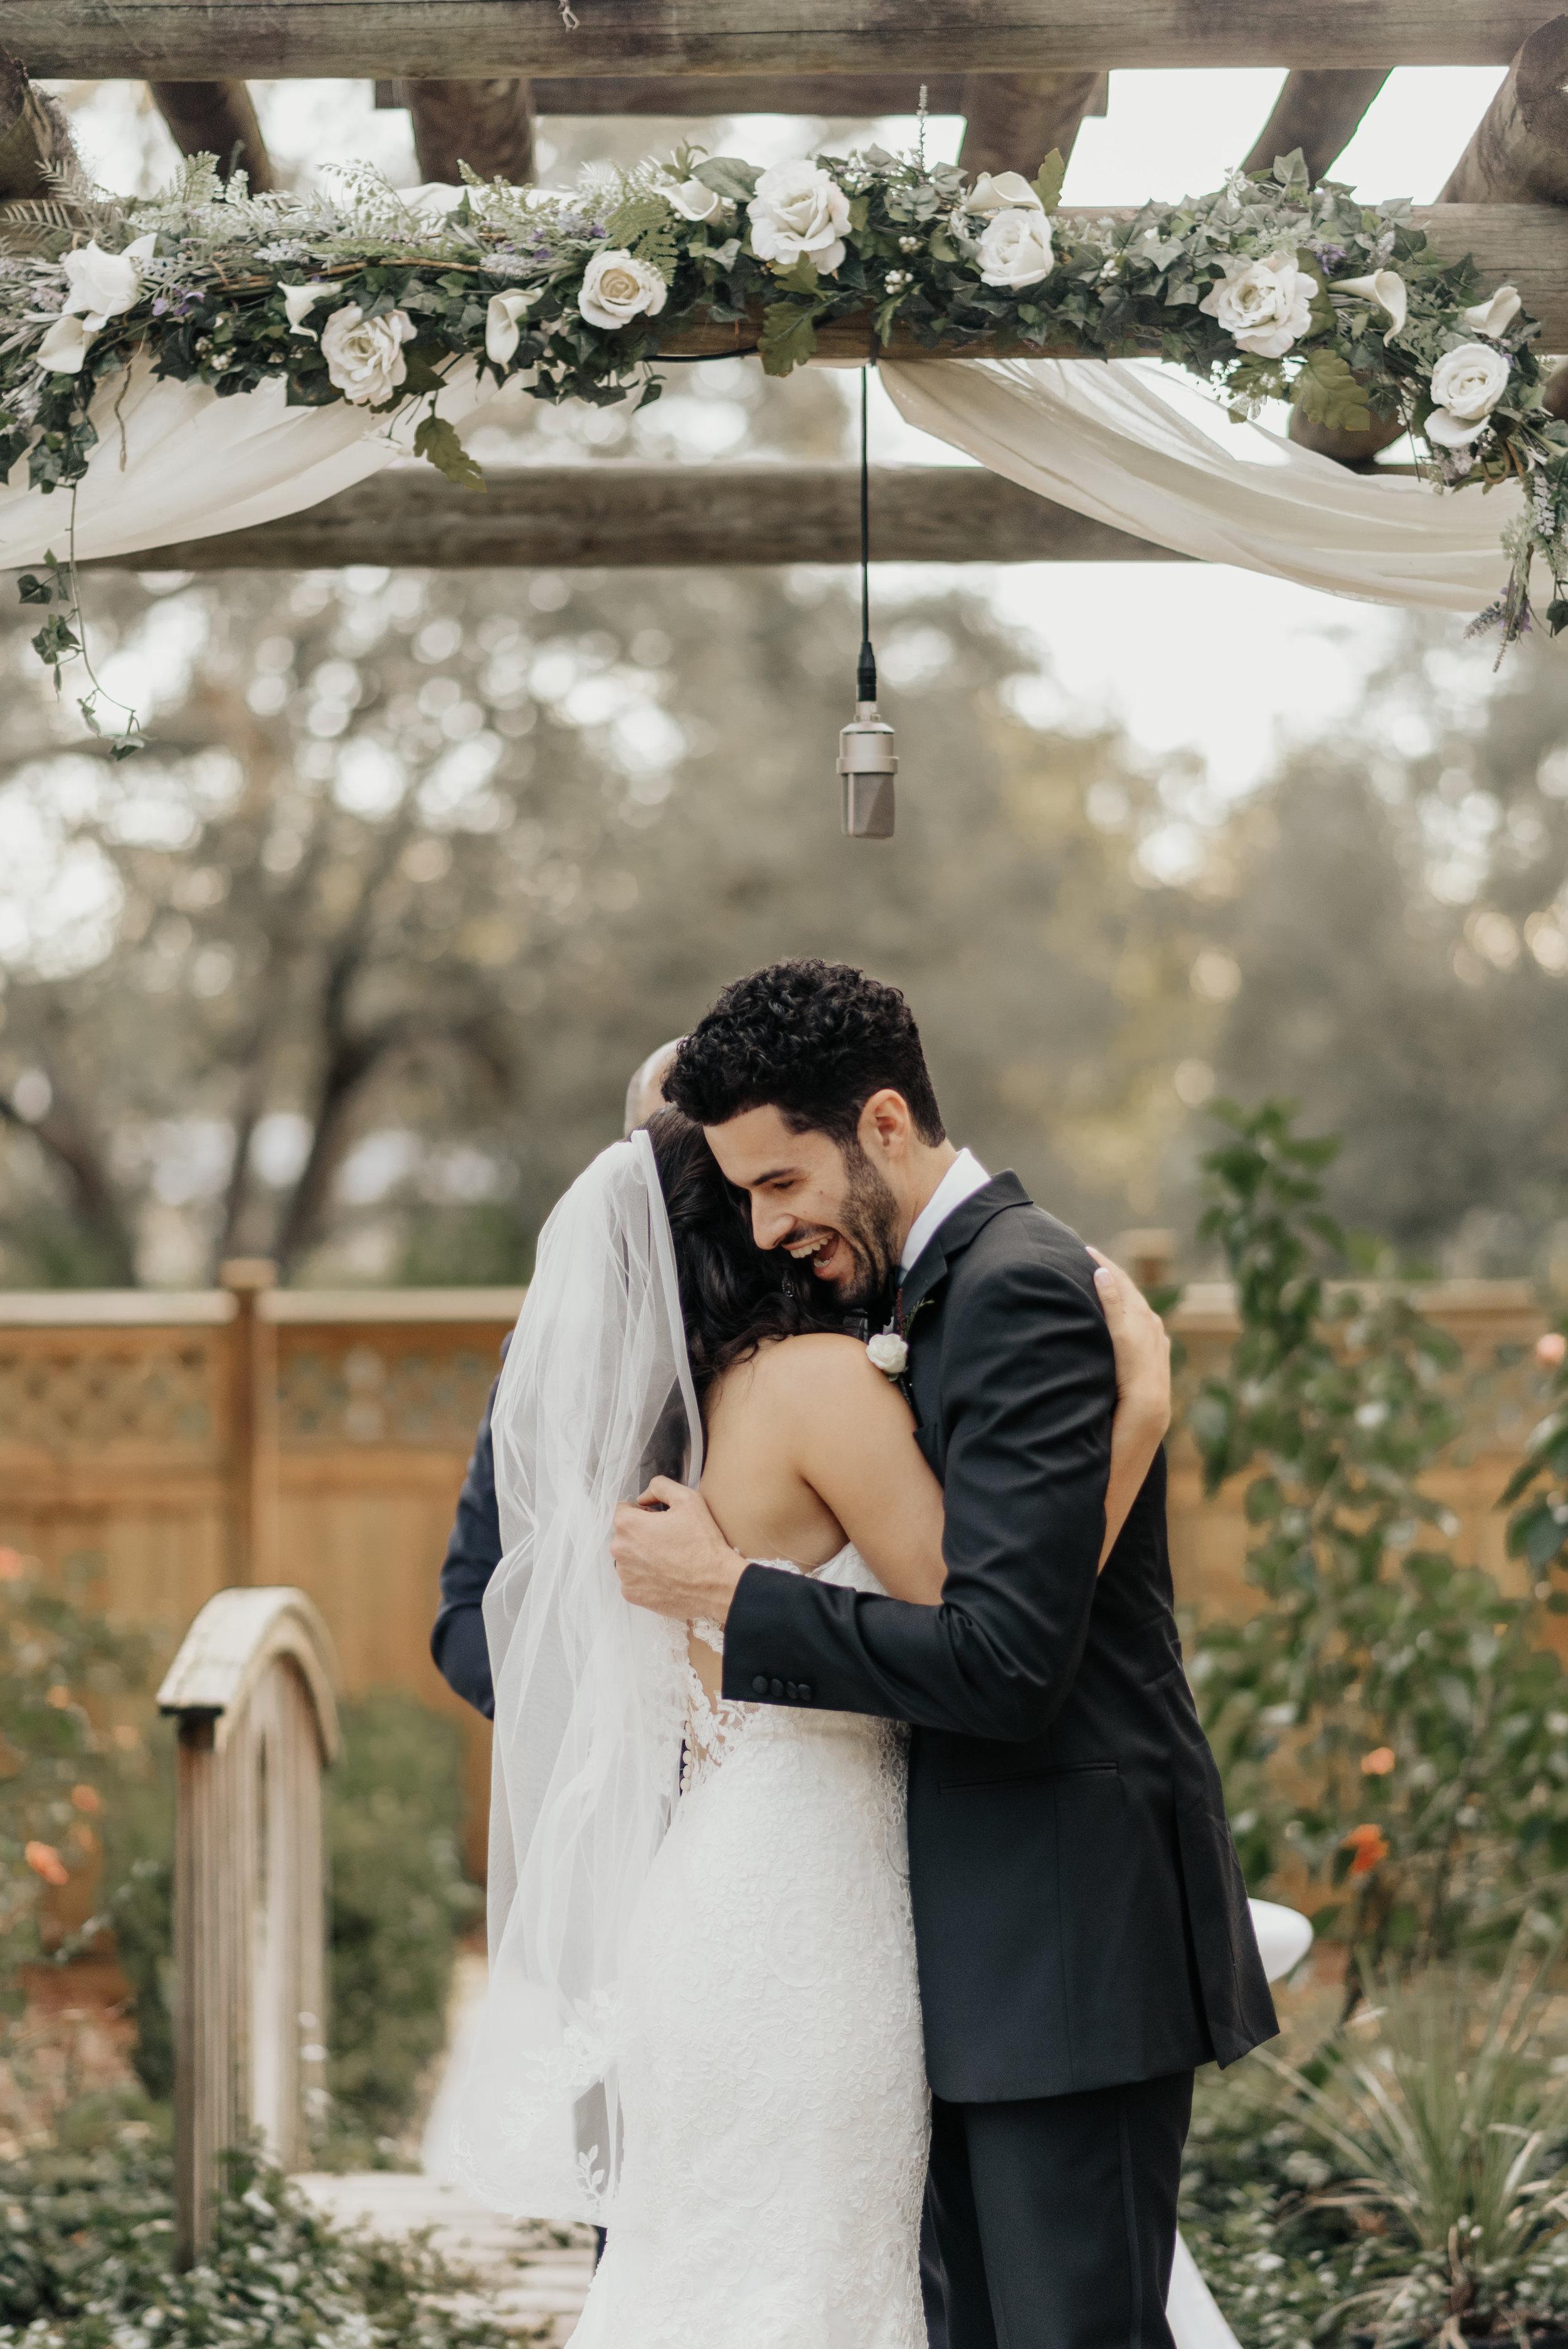 Kirstie-AJ-Wedding-0074.jpg